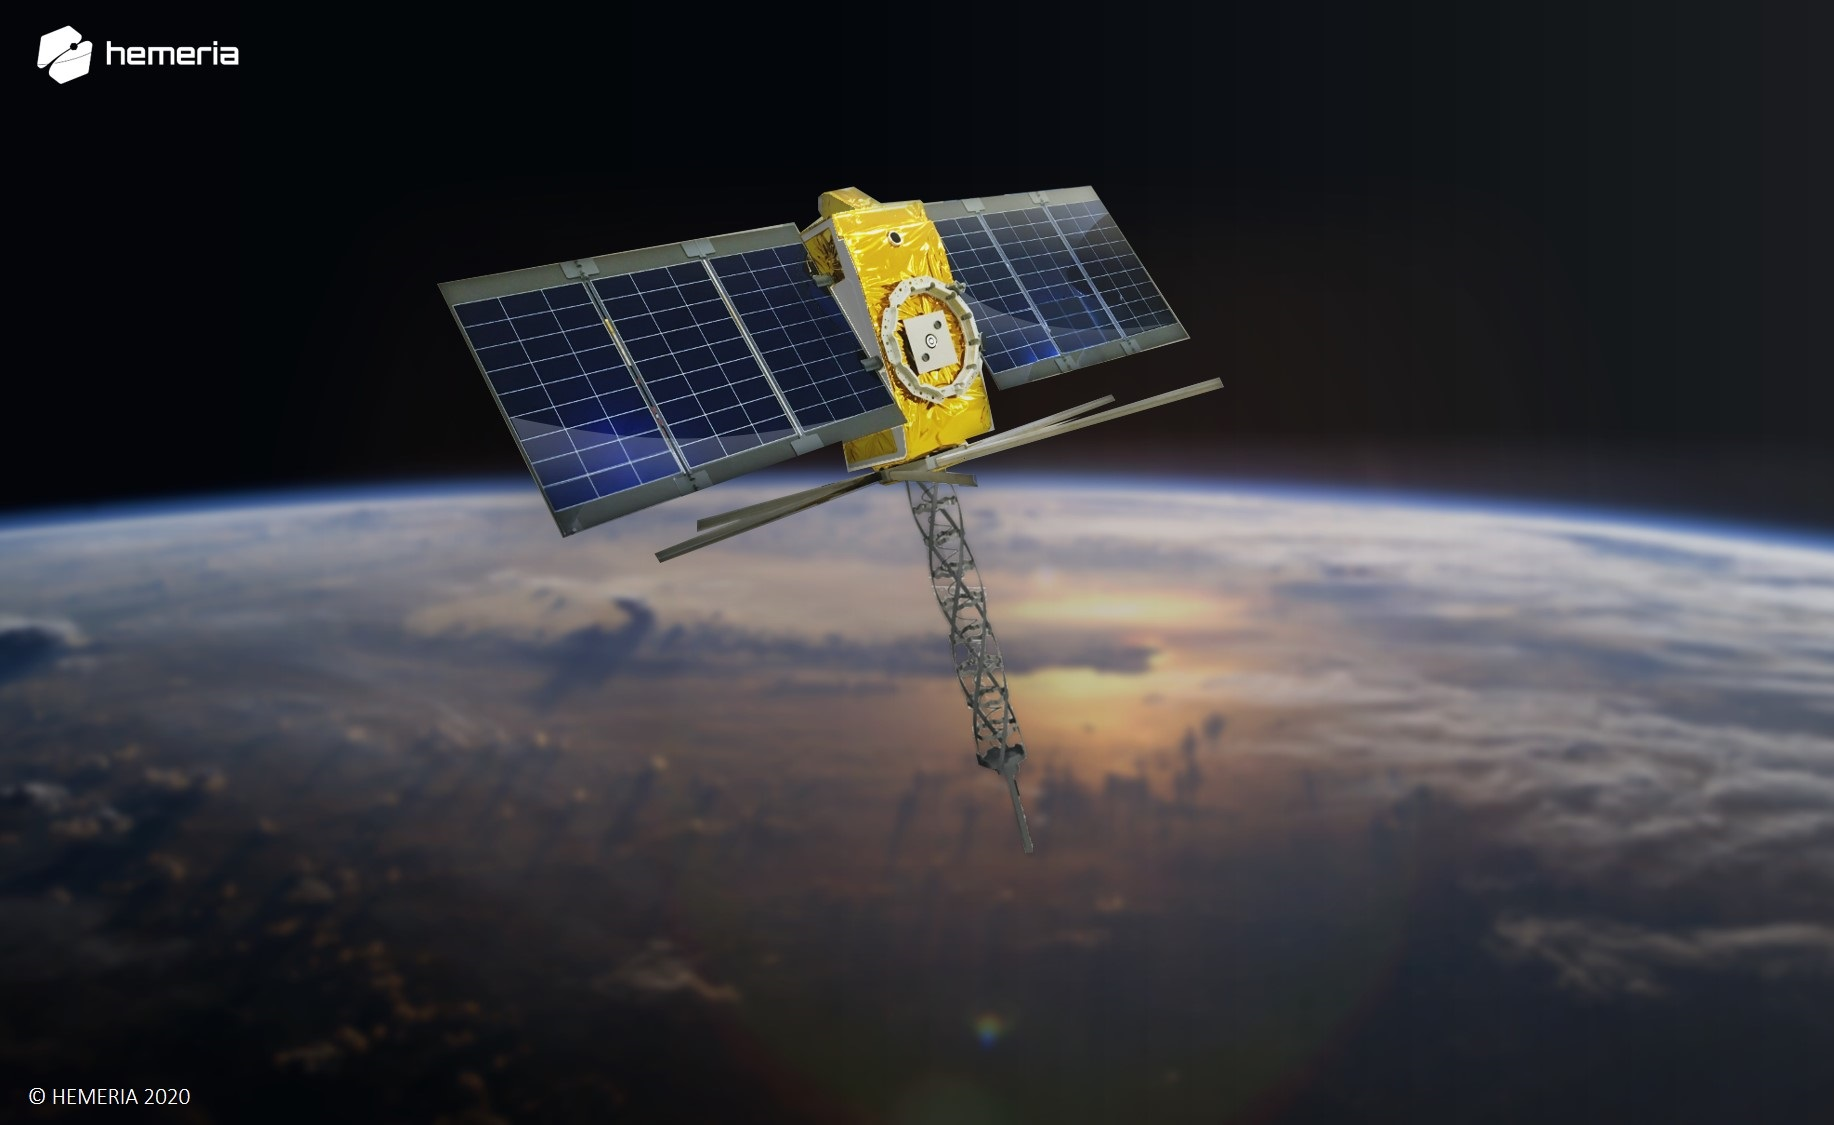 Kinéis' nanosatellite